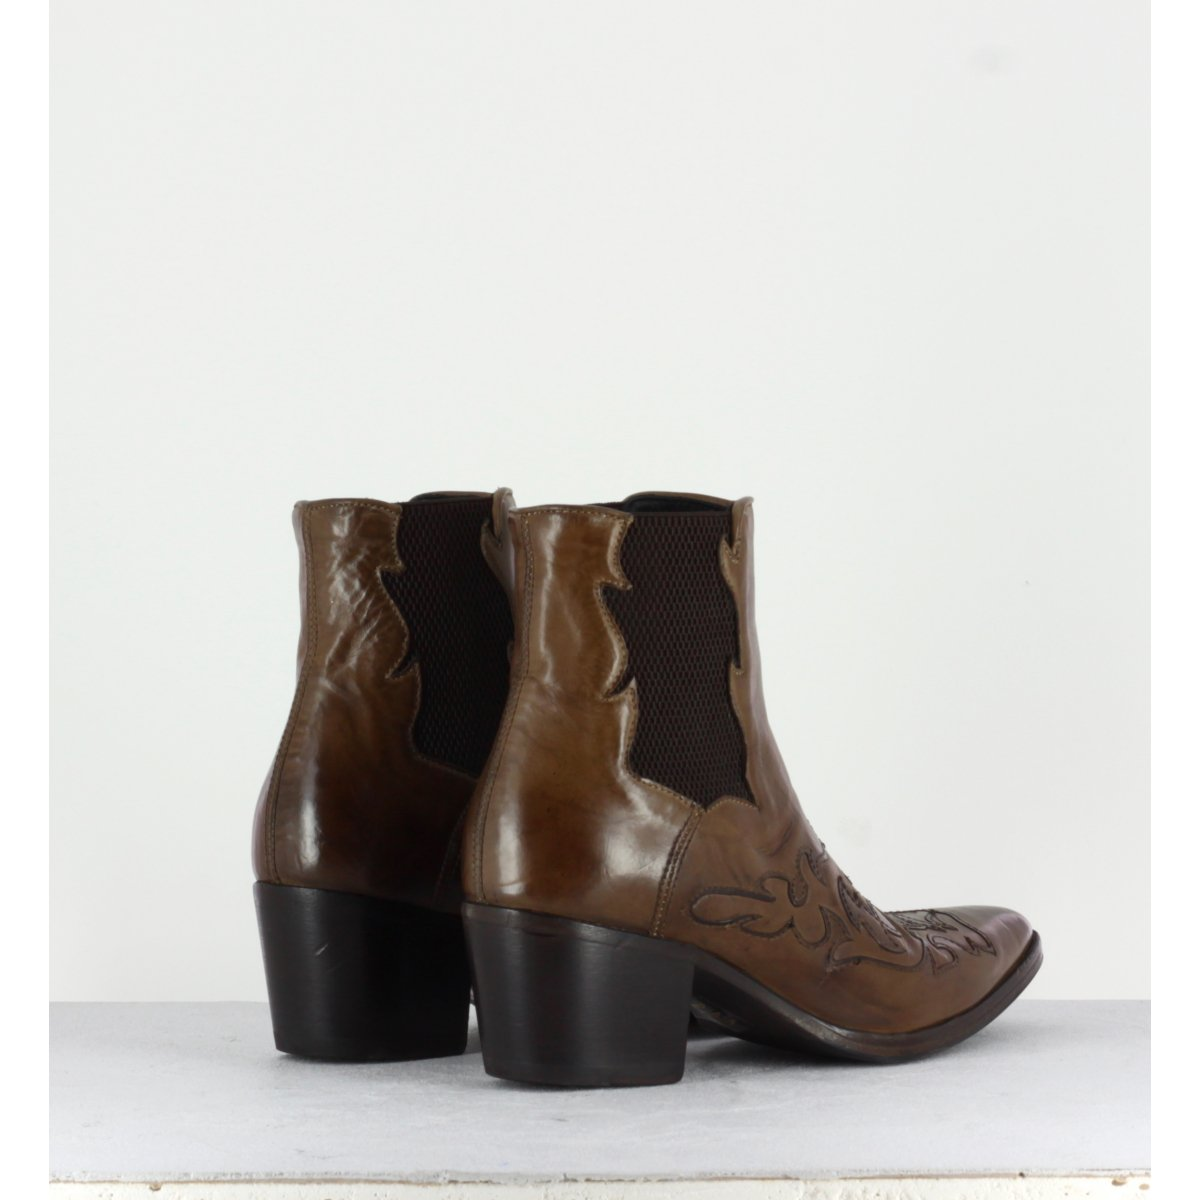 Santiag en cuir marron Alberto Fasciani femme -URSULA 46036M